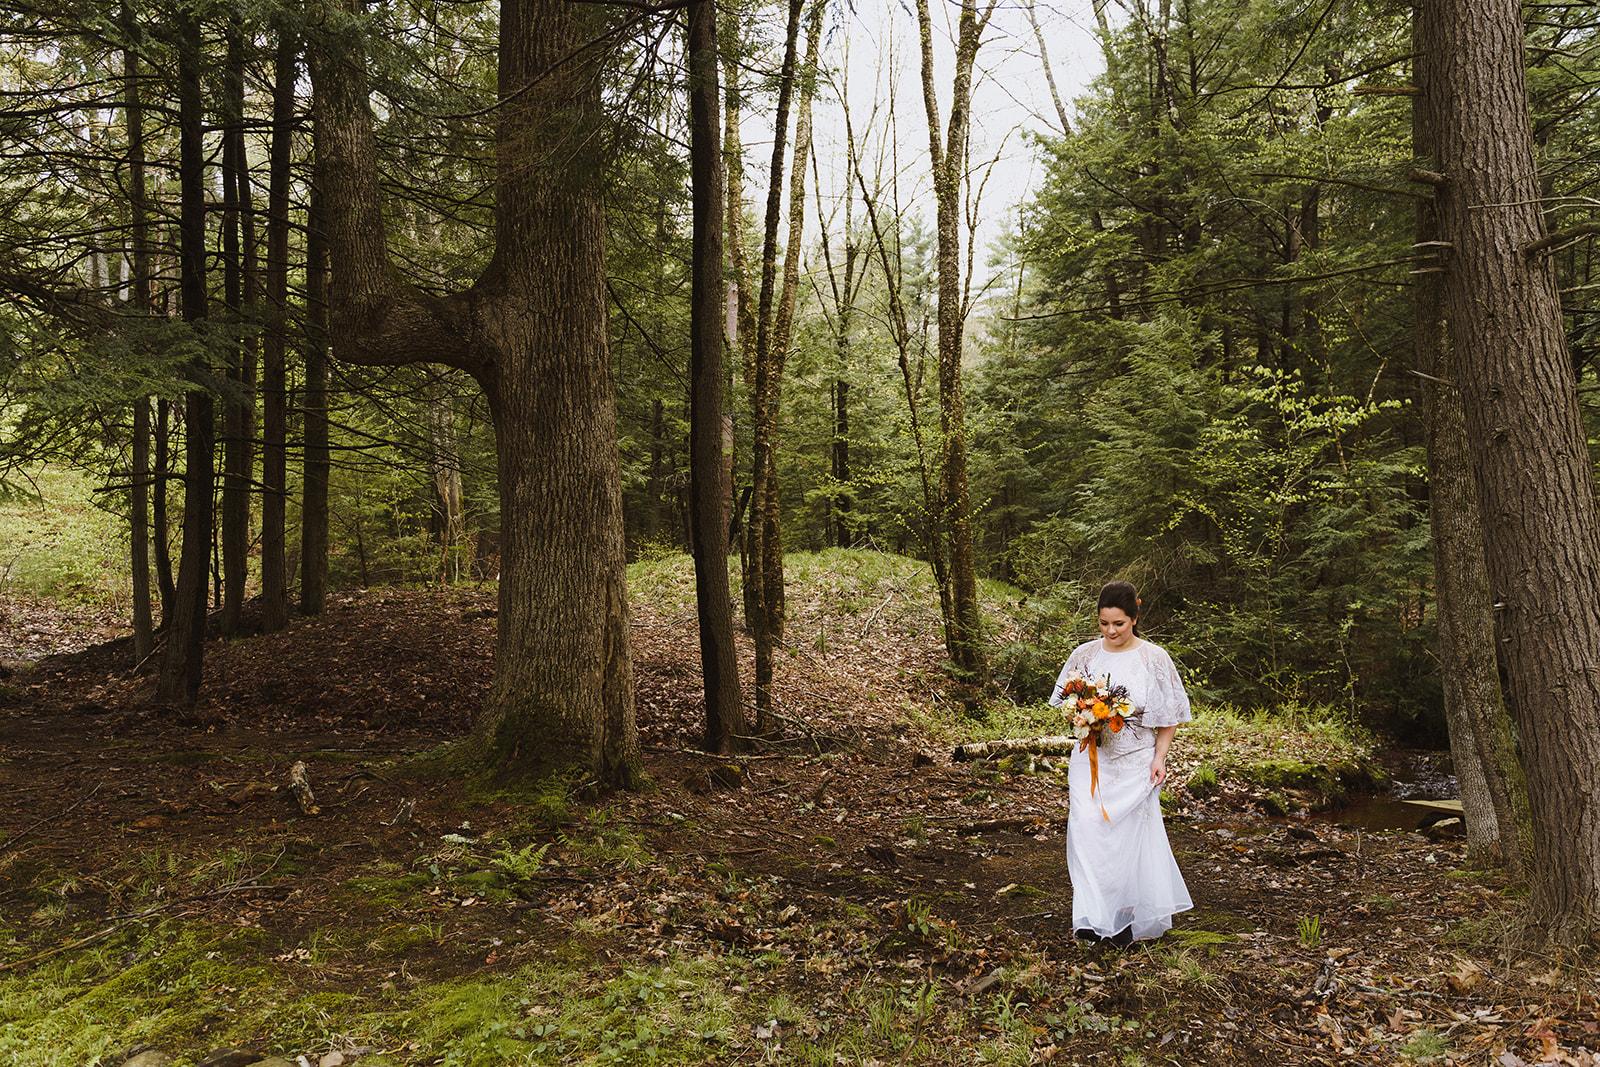 Tuckaway Tree Farm Lebanon Maine Wedding Inspiration 30